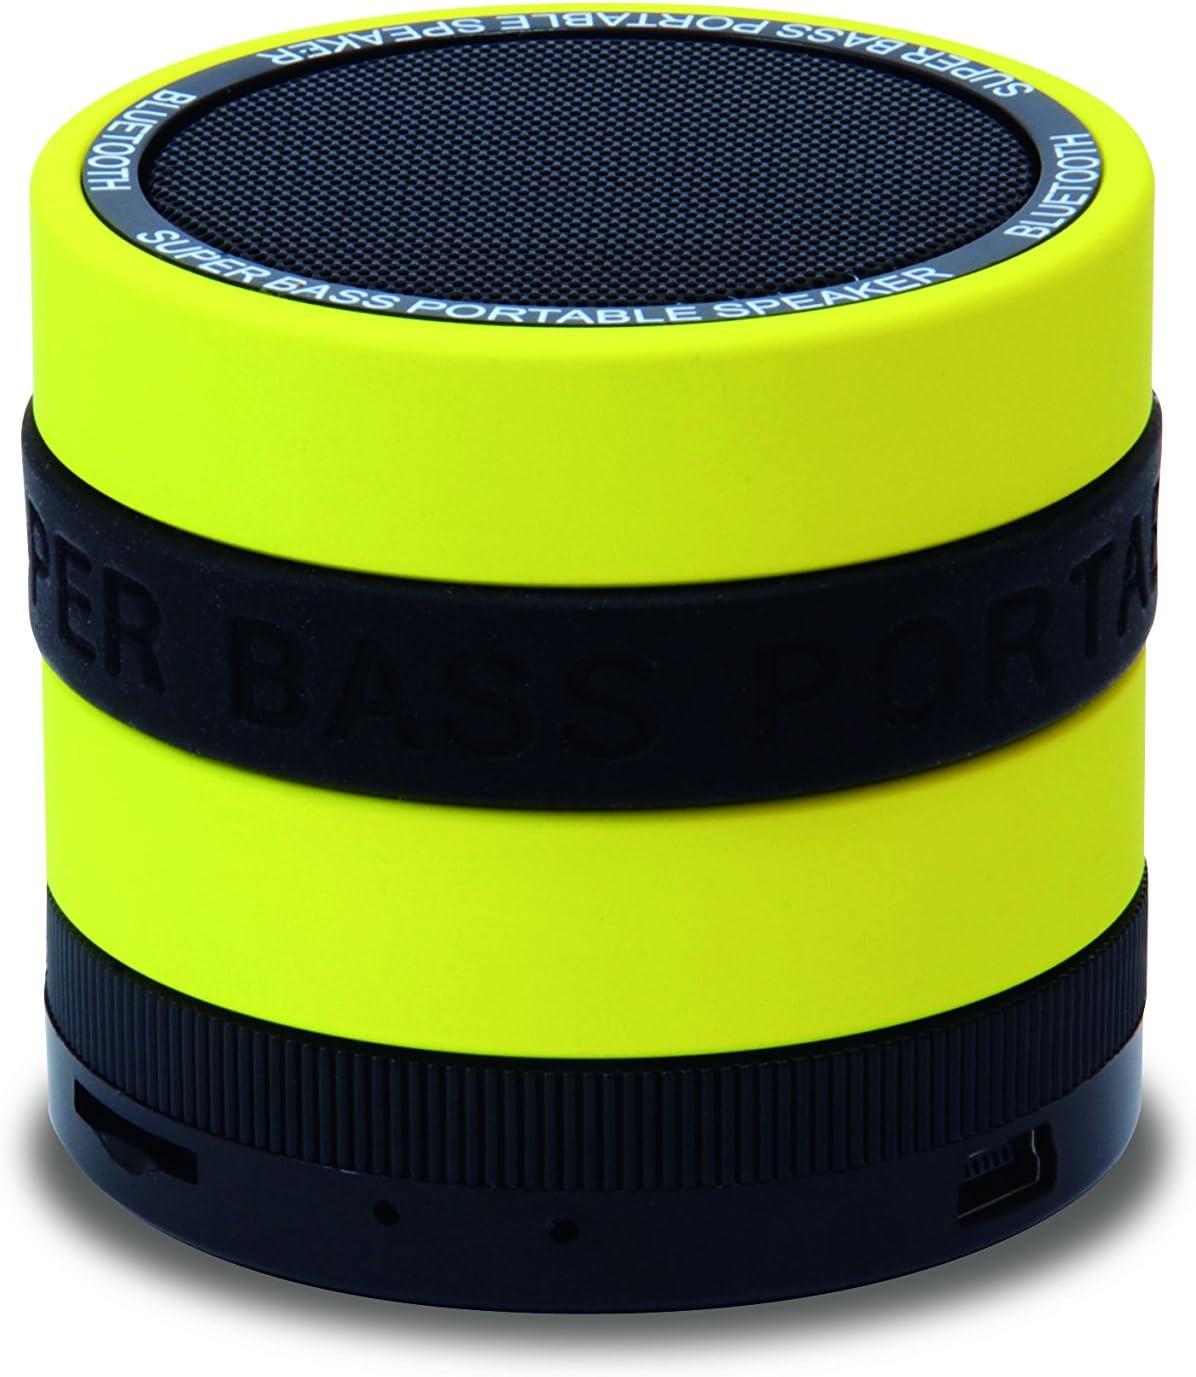 Conceptronic CSPKBTSBY 3 W Negro, Amarillo - Altavoces portátiles (3 W, 85 dB, 0,5%, Inalámbrico y alámbrico, 10 m, Mini-USB)